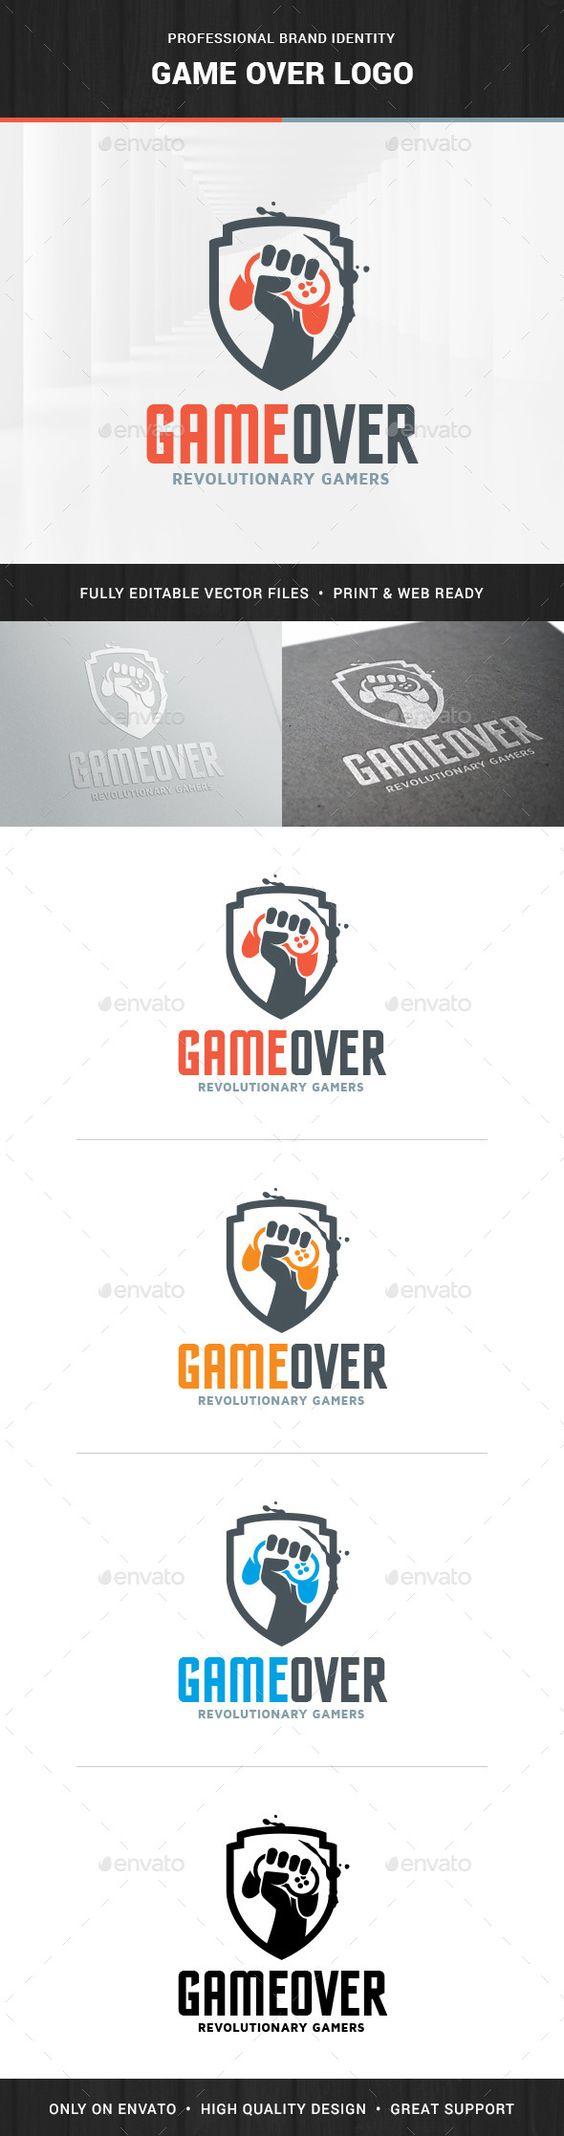 Game Over Logo Template | Logo Templates, Logos and Templates